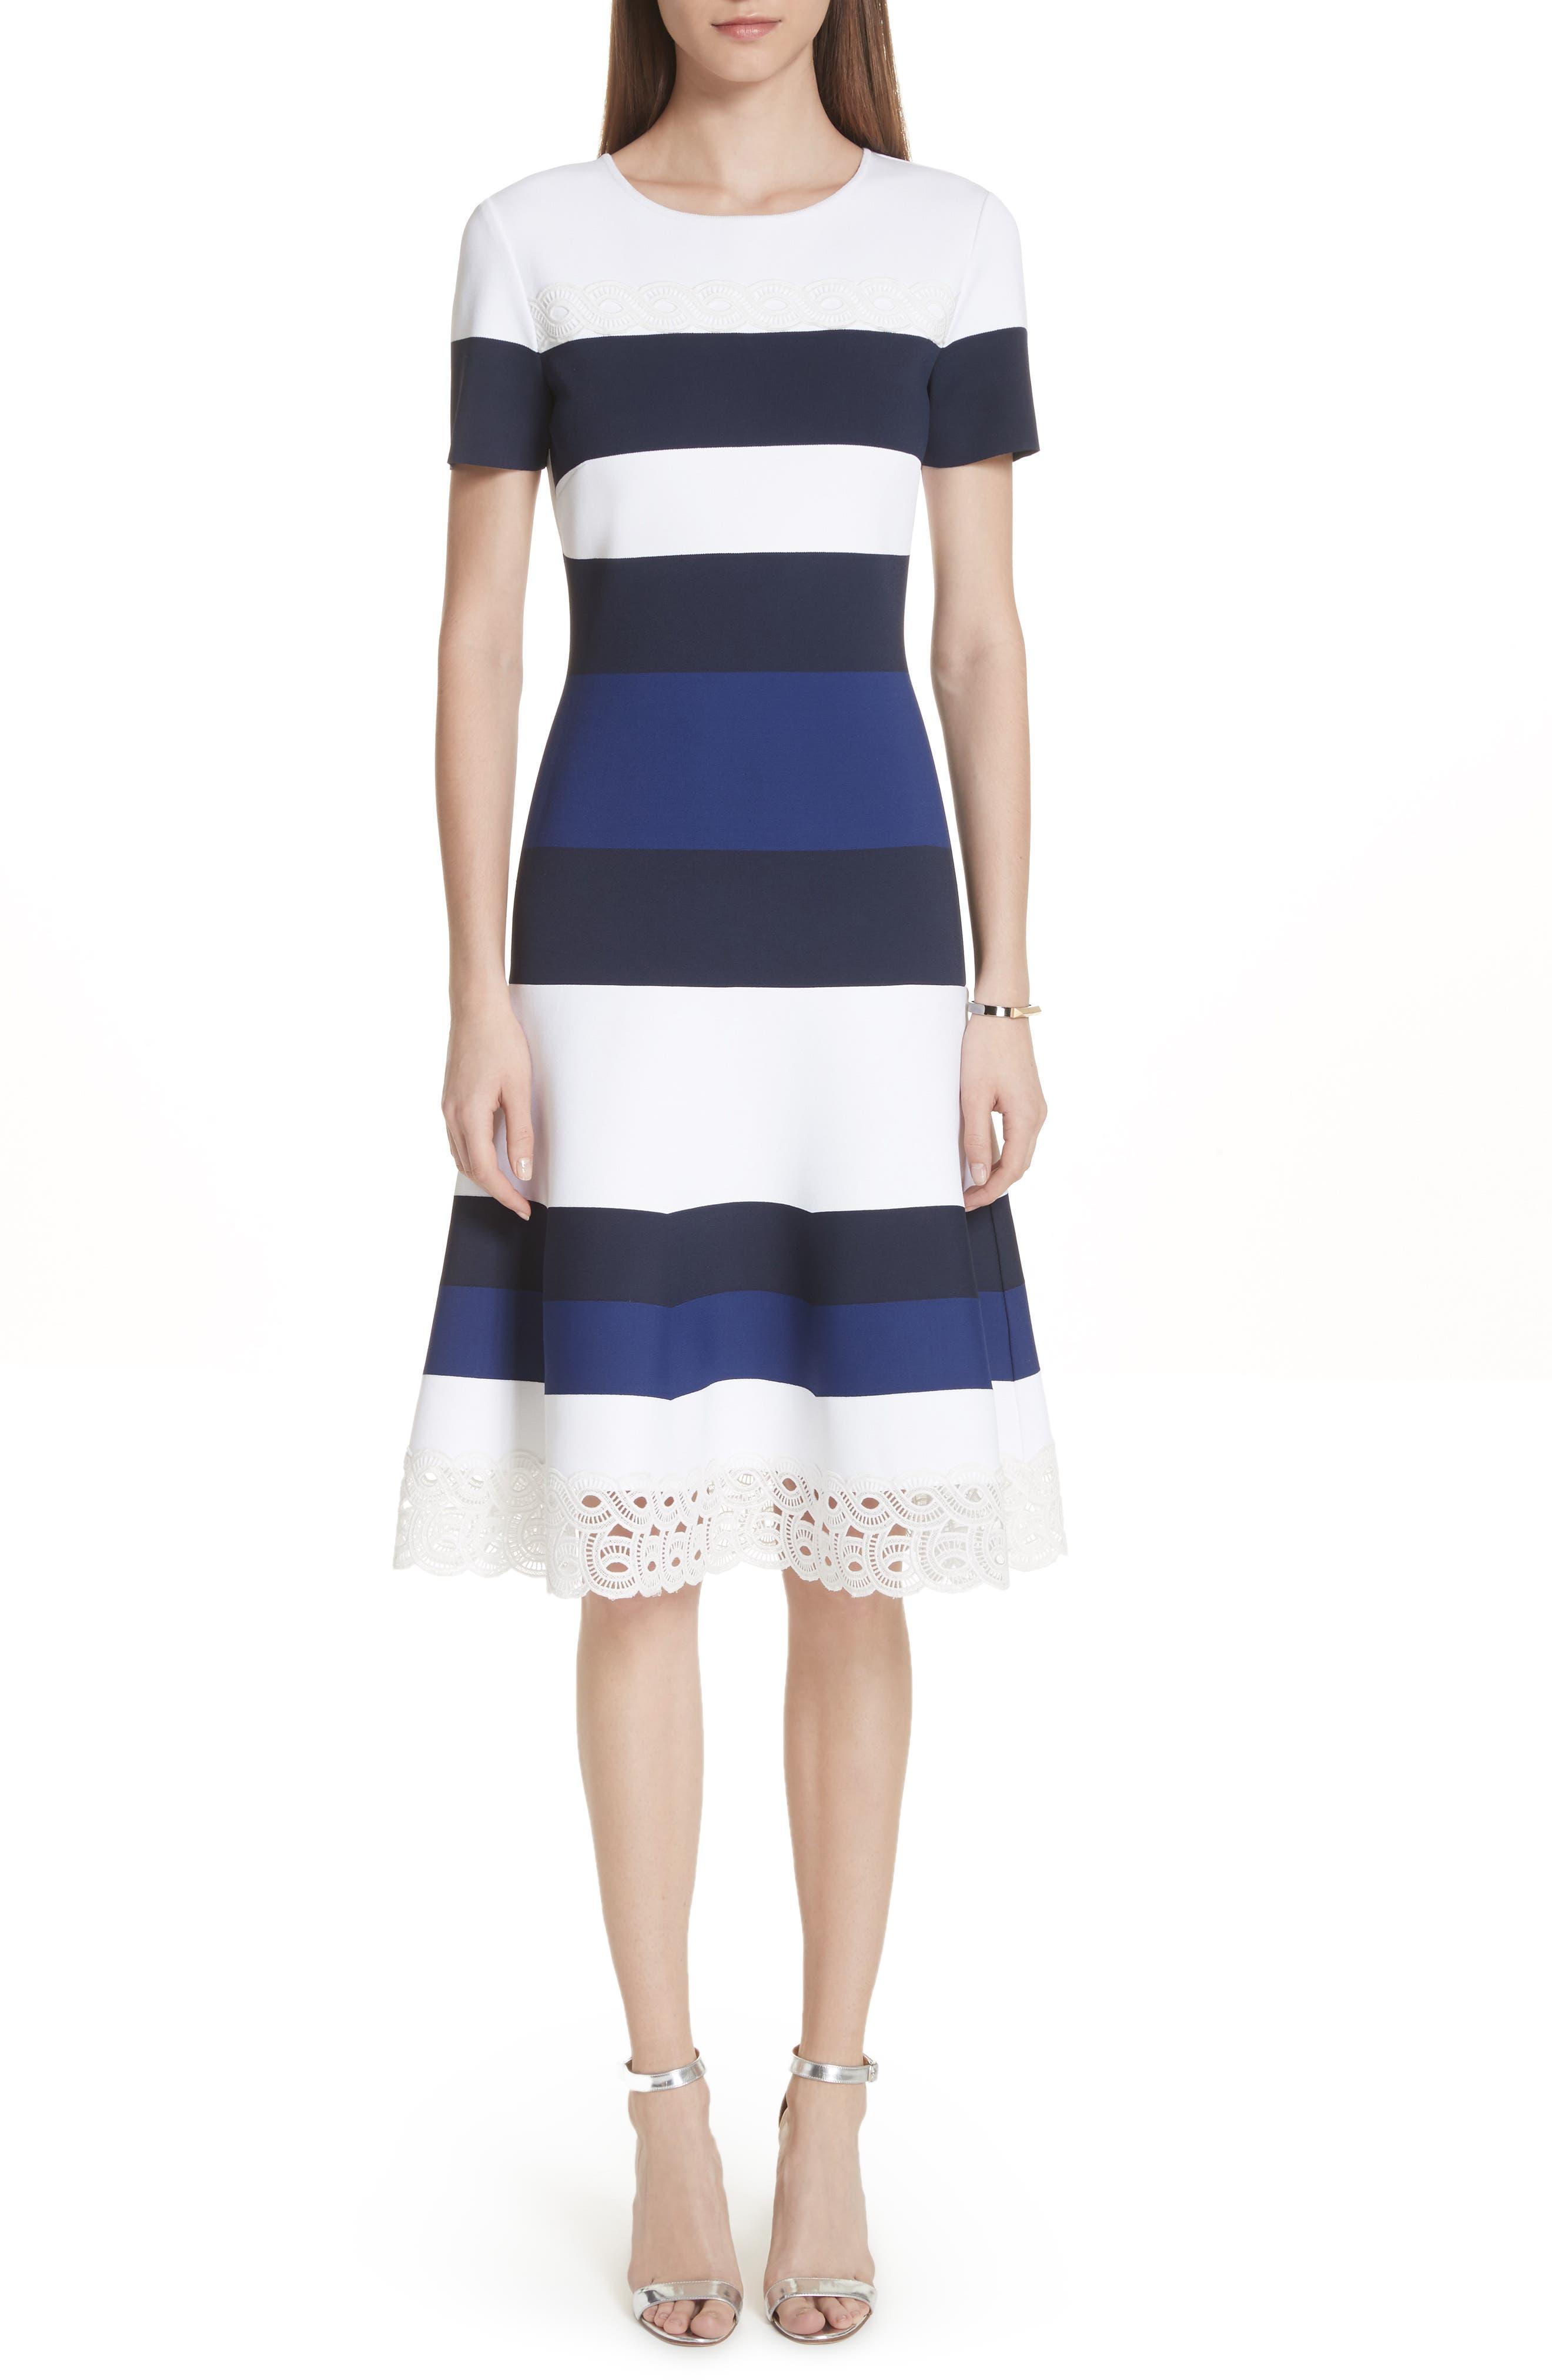 ST. JOHN Striped Luxe Sculpture Knit Lace-Trim Dress in Bianco/ Dark Cornflower/ Navy